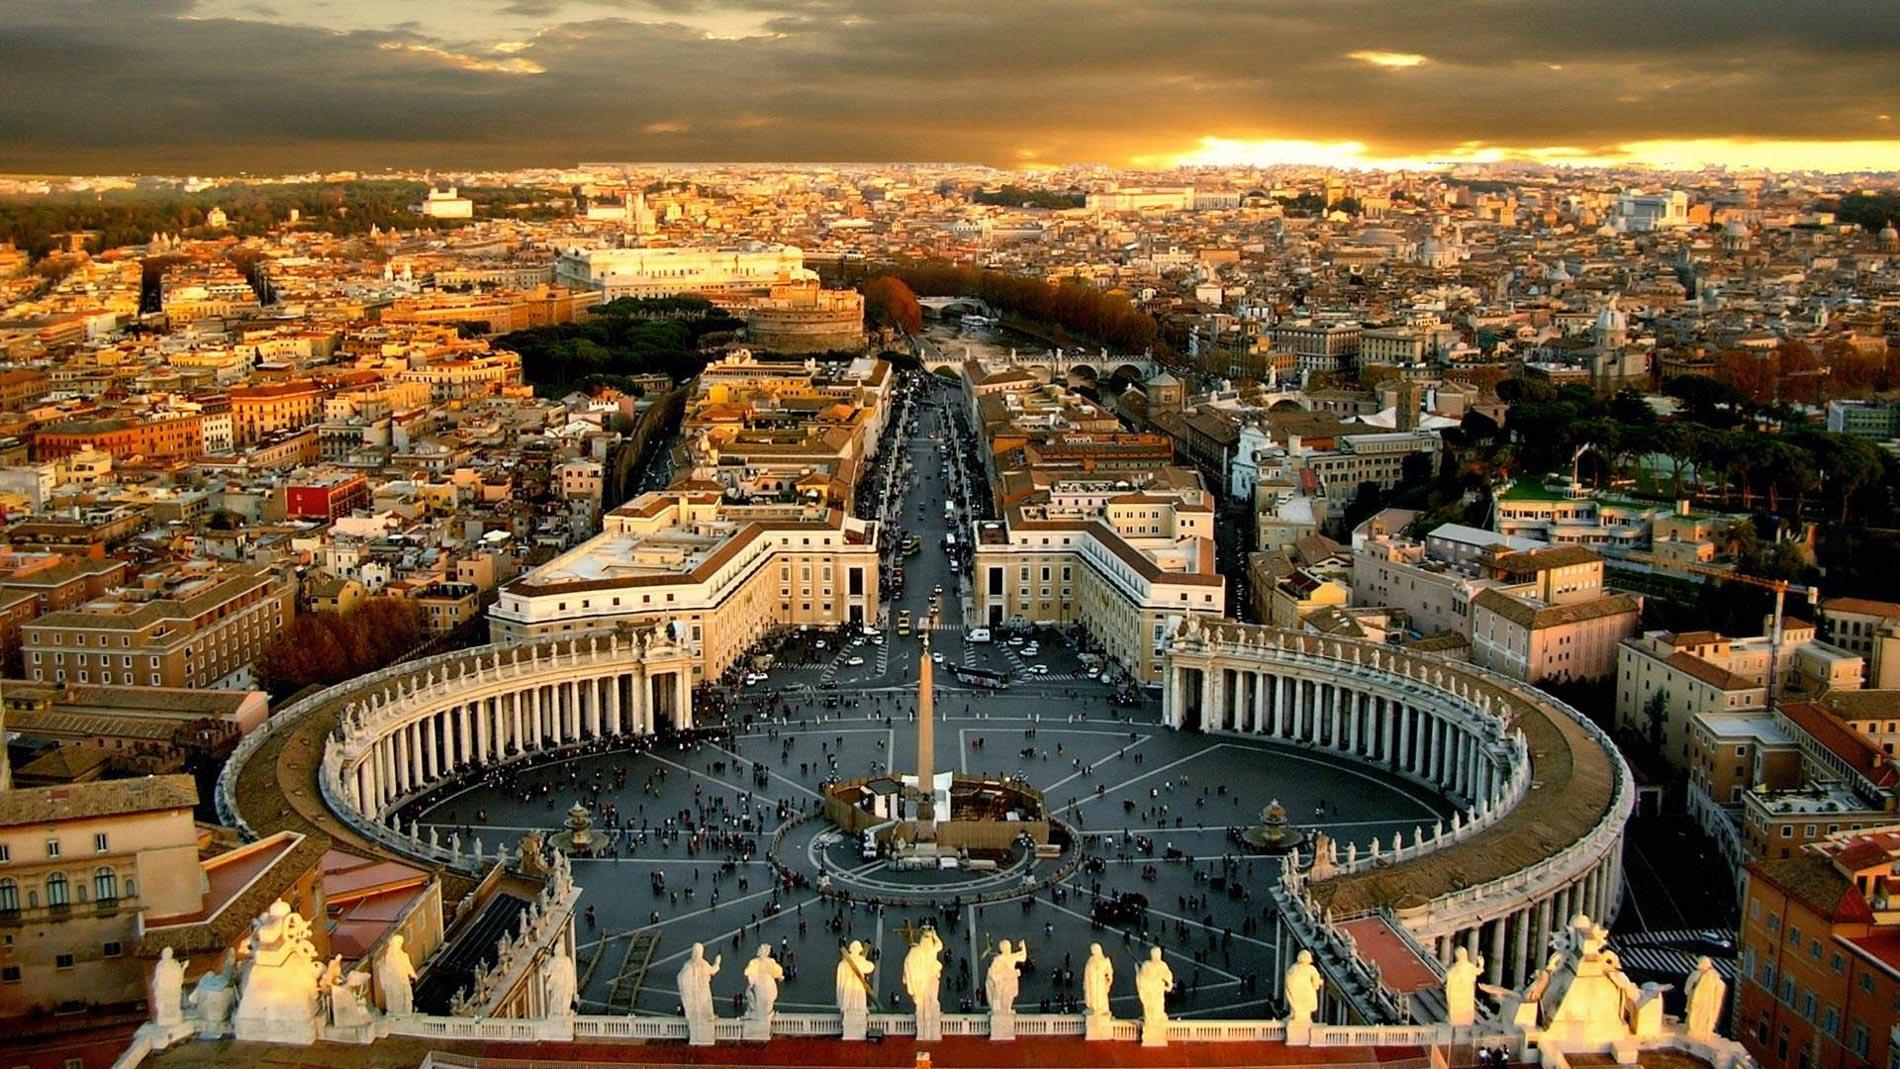 Benedict XVI: Saint Paul's Eschatology